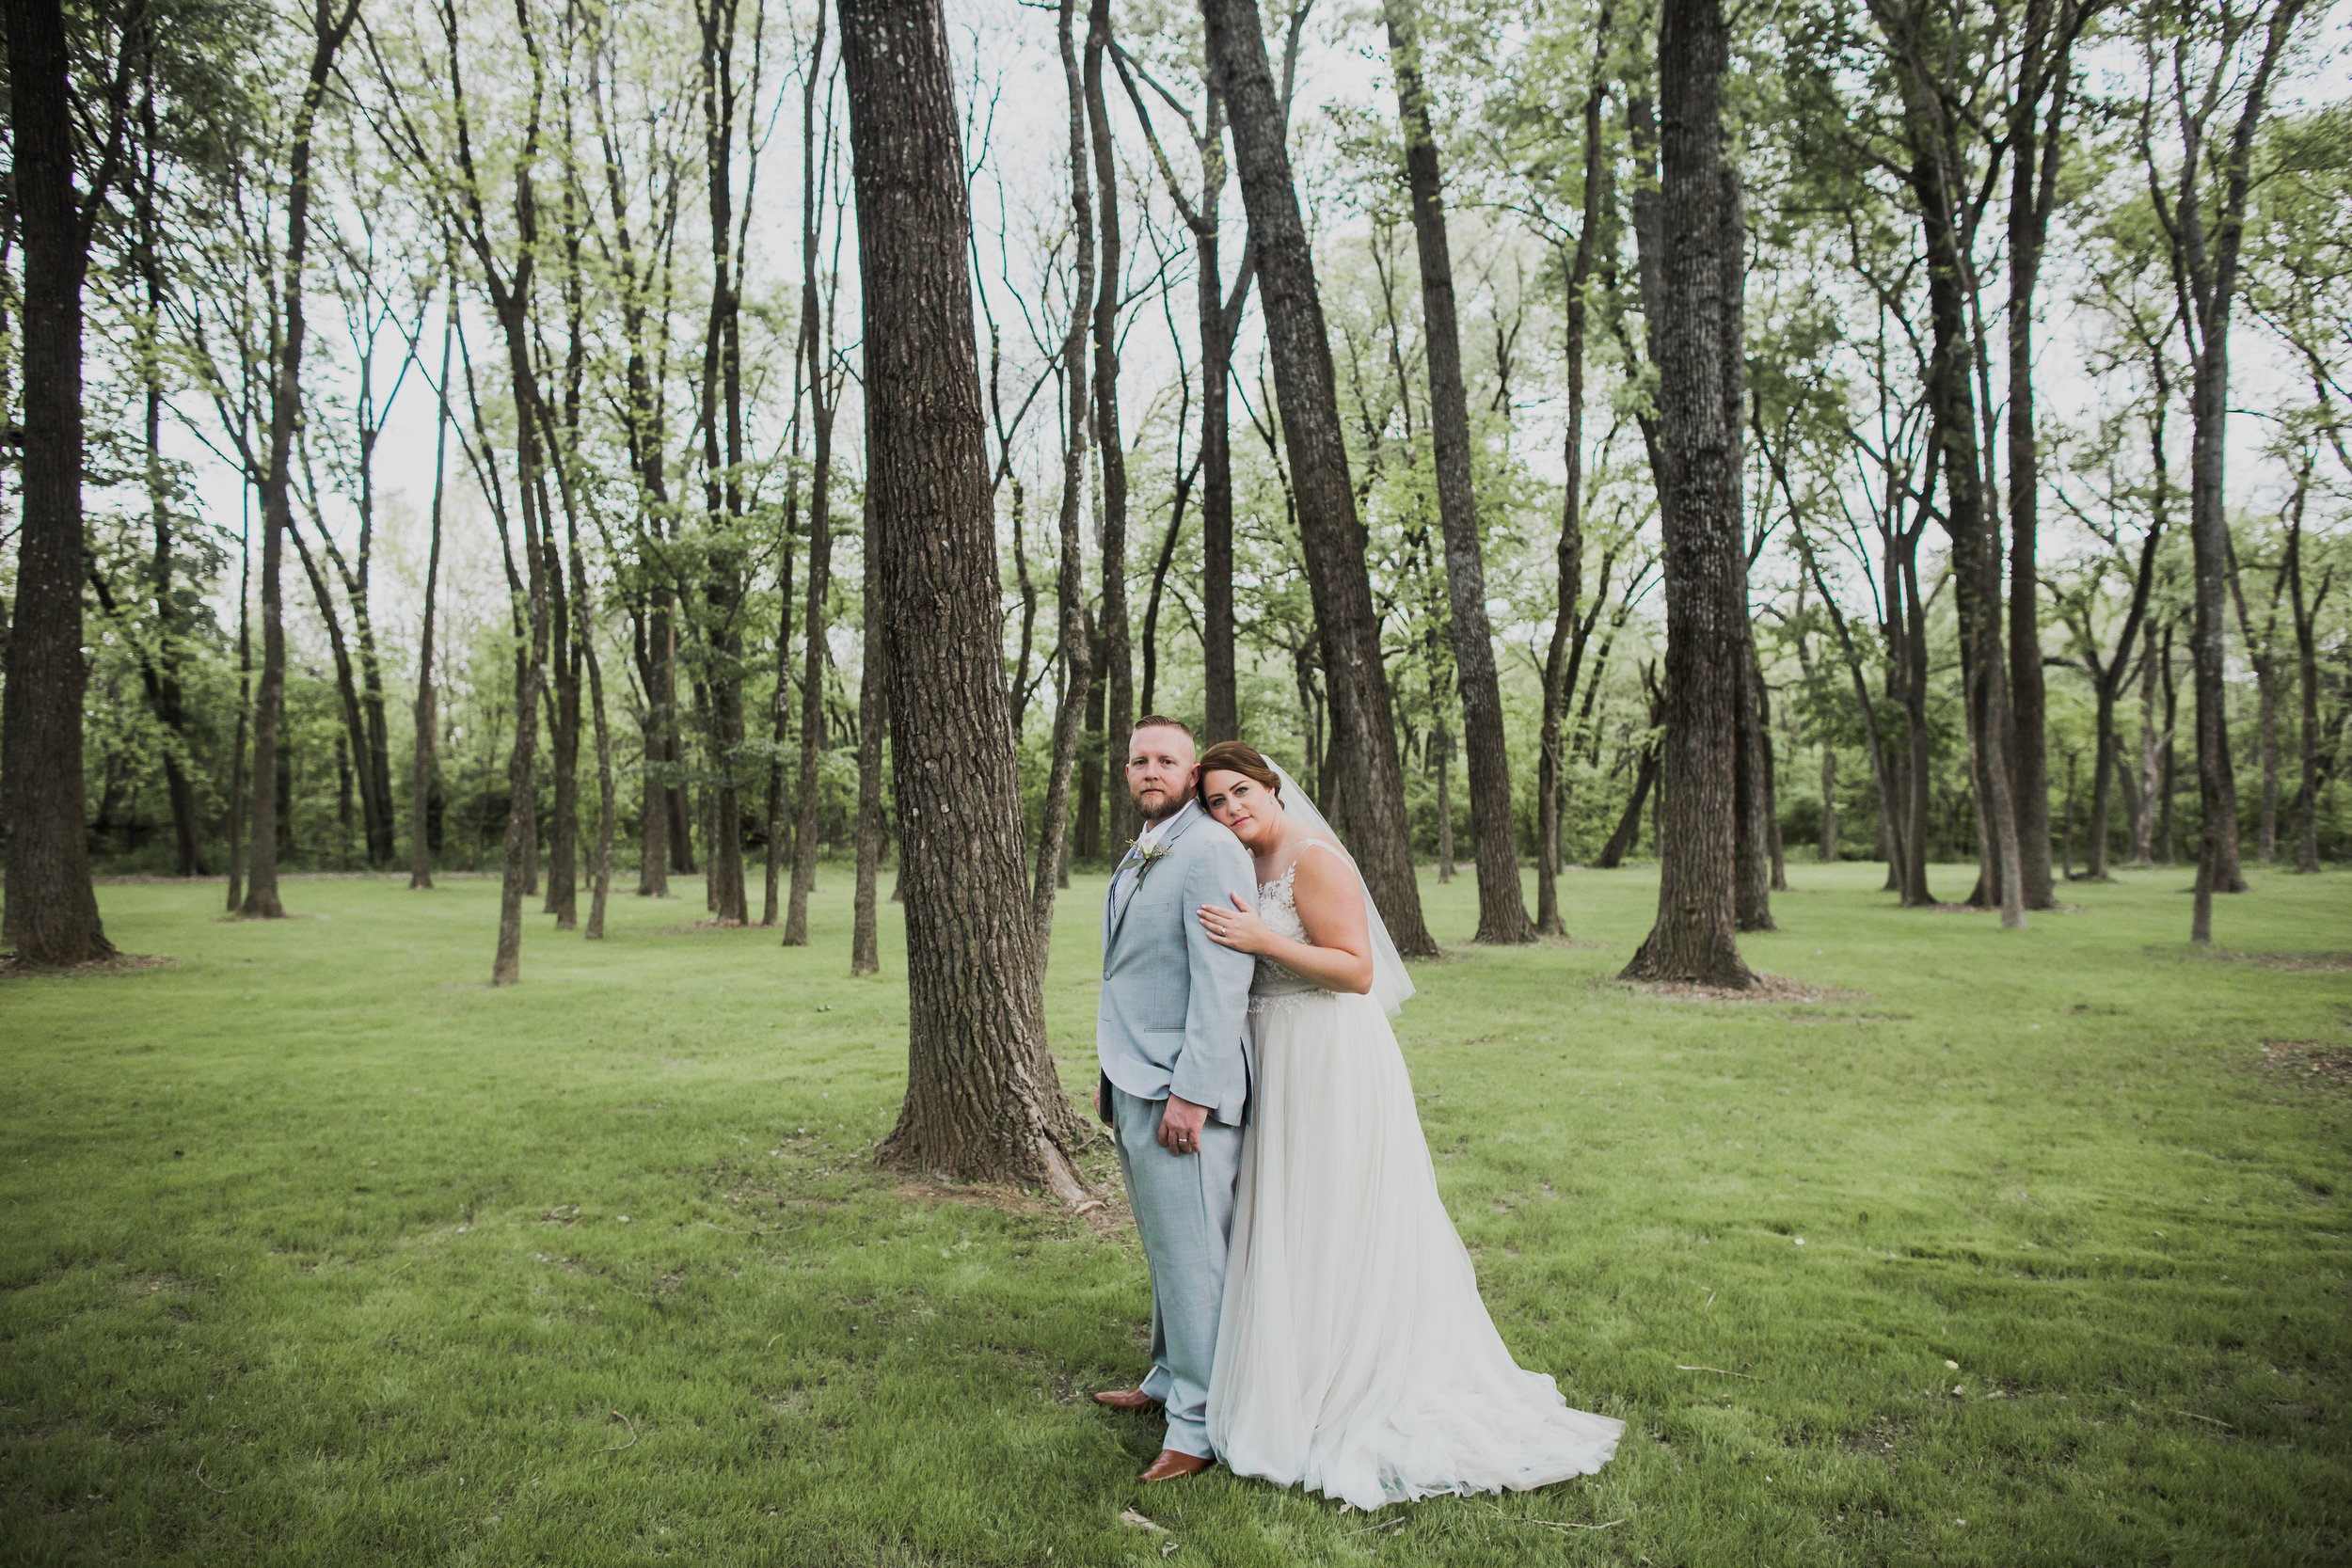 nbarrett_rent my dust_wilson wedding (14).jpg